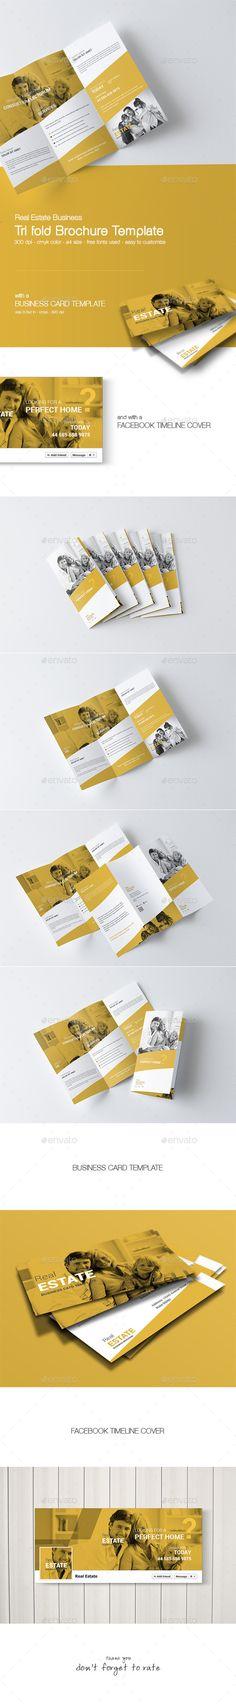 The 15 Best Design Flyer Images On Pinterest Brochure Template